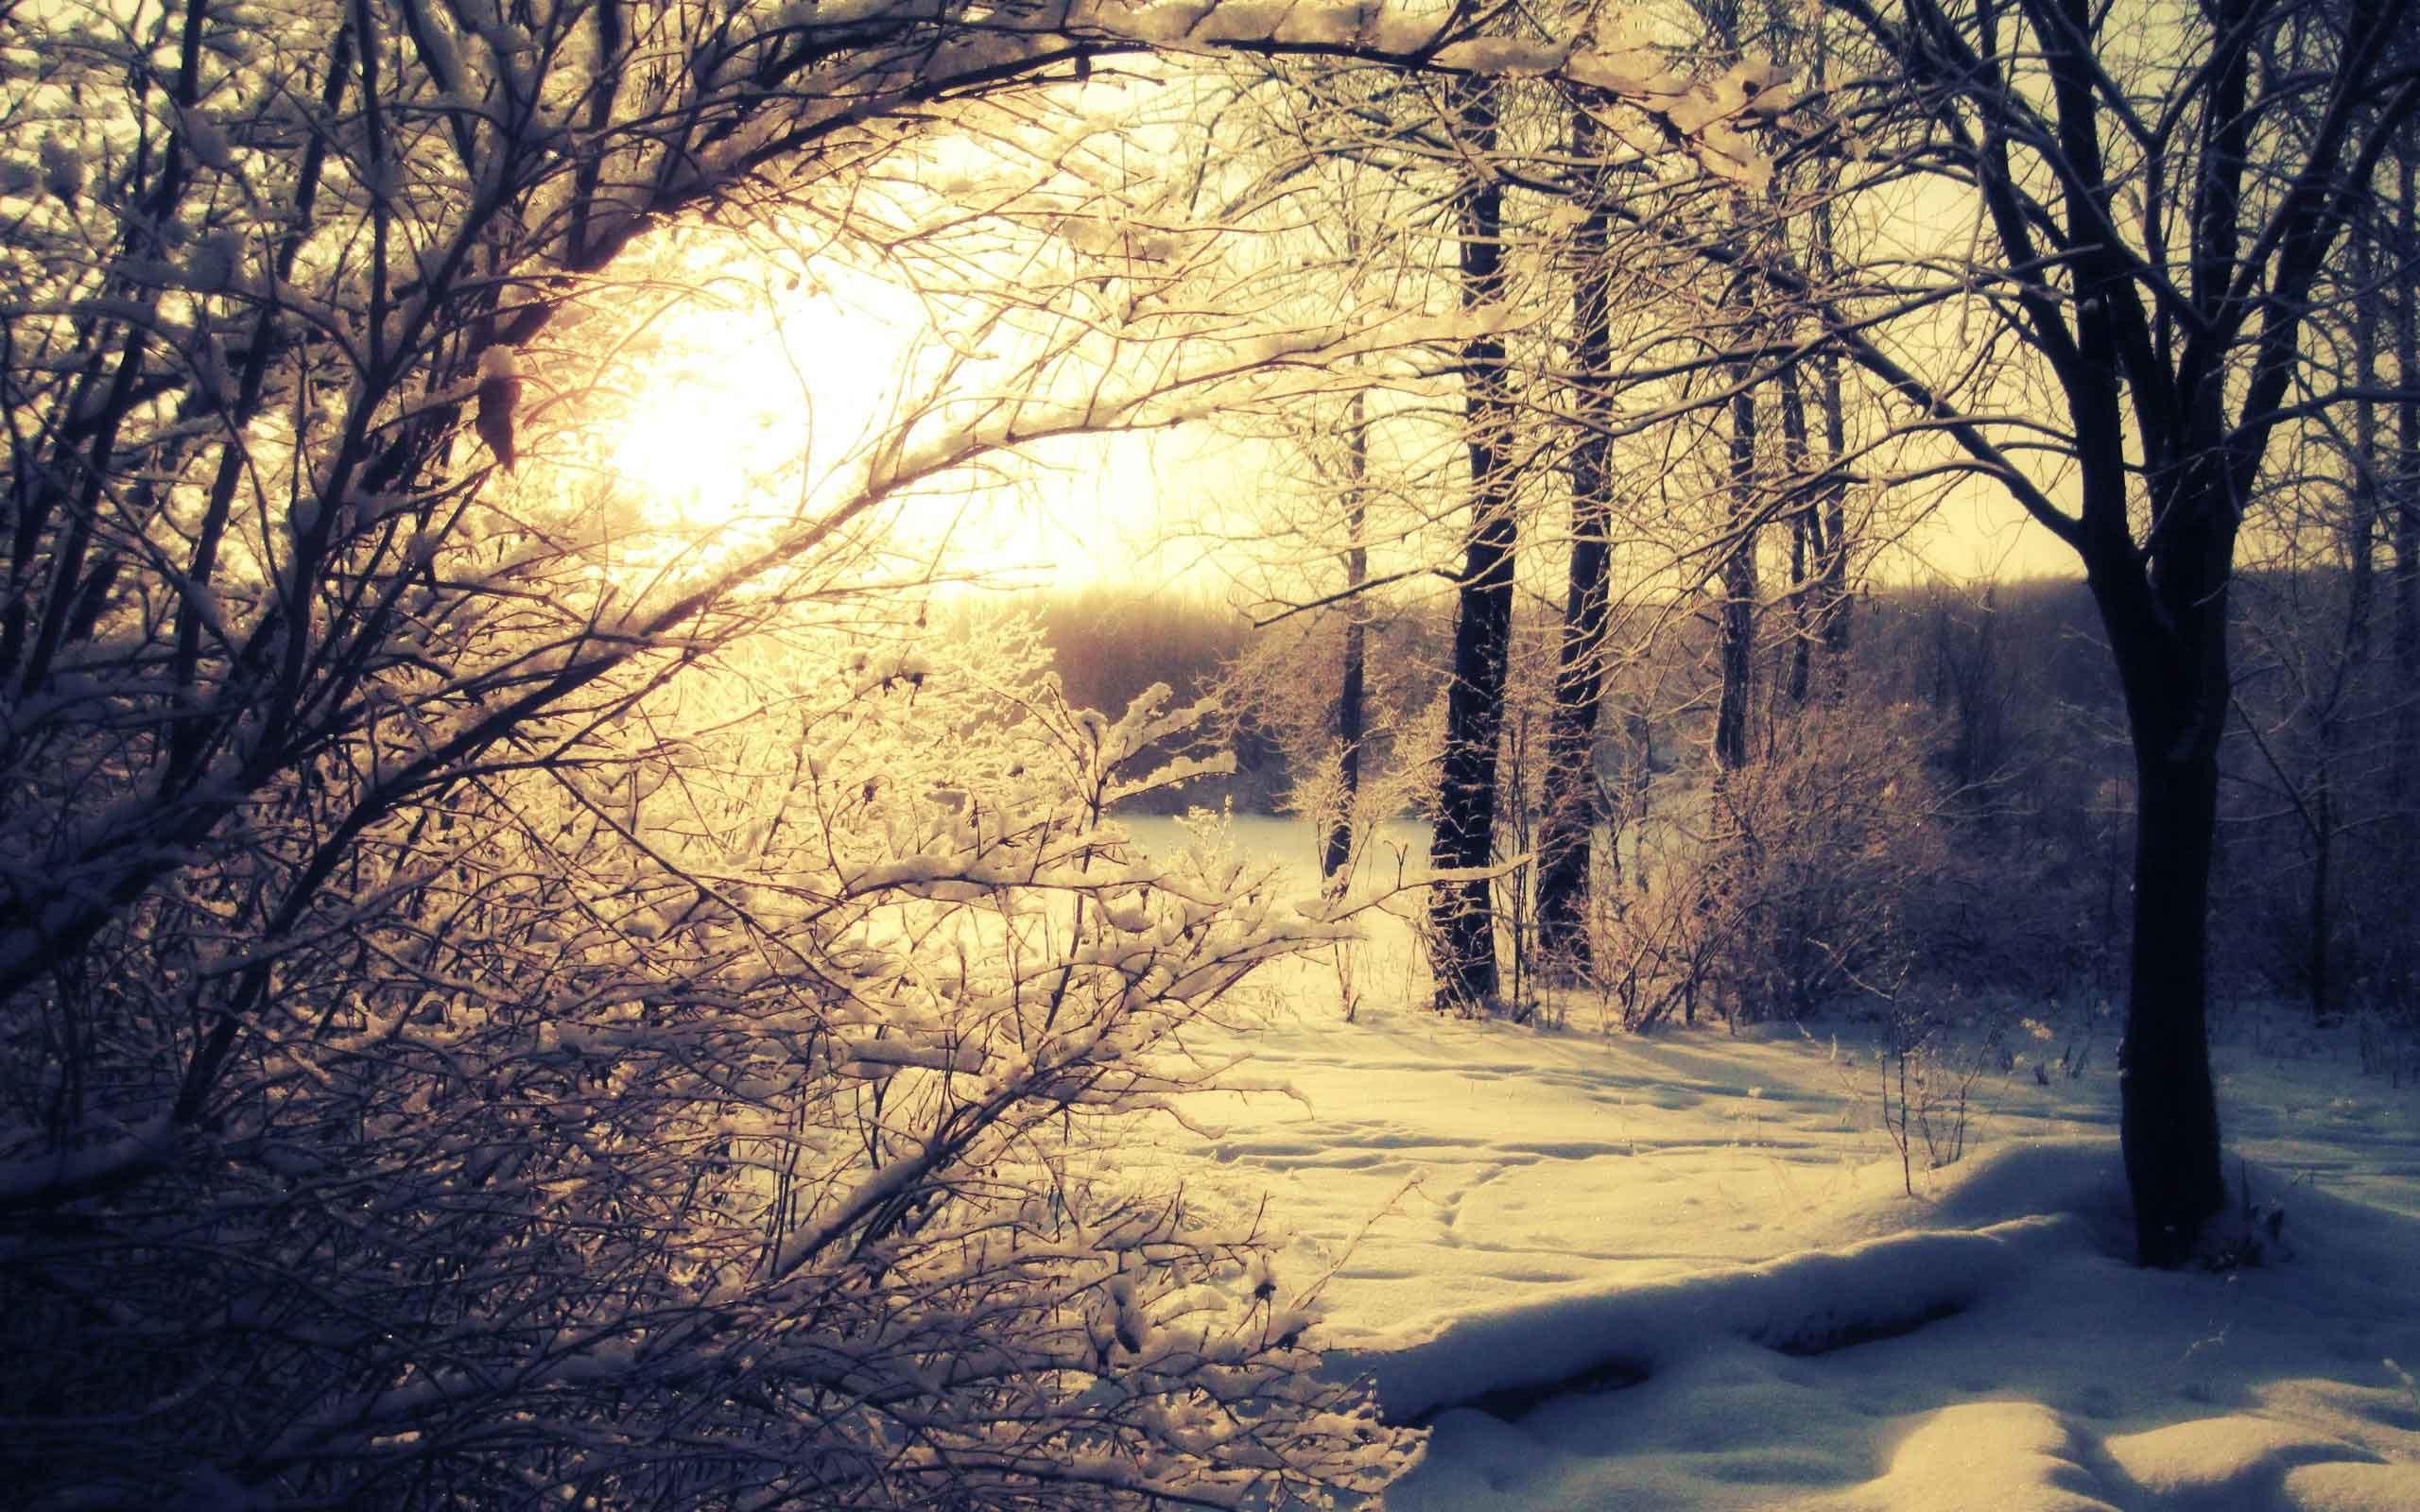 Sunrise Sunset Snow Landscape Winter Nature Wallpaper HD For Mobile 1080p